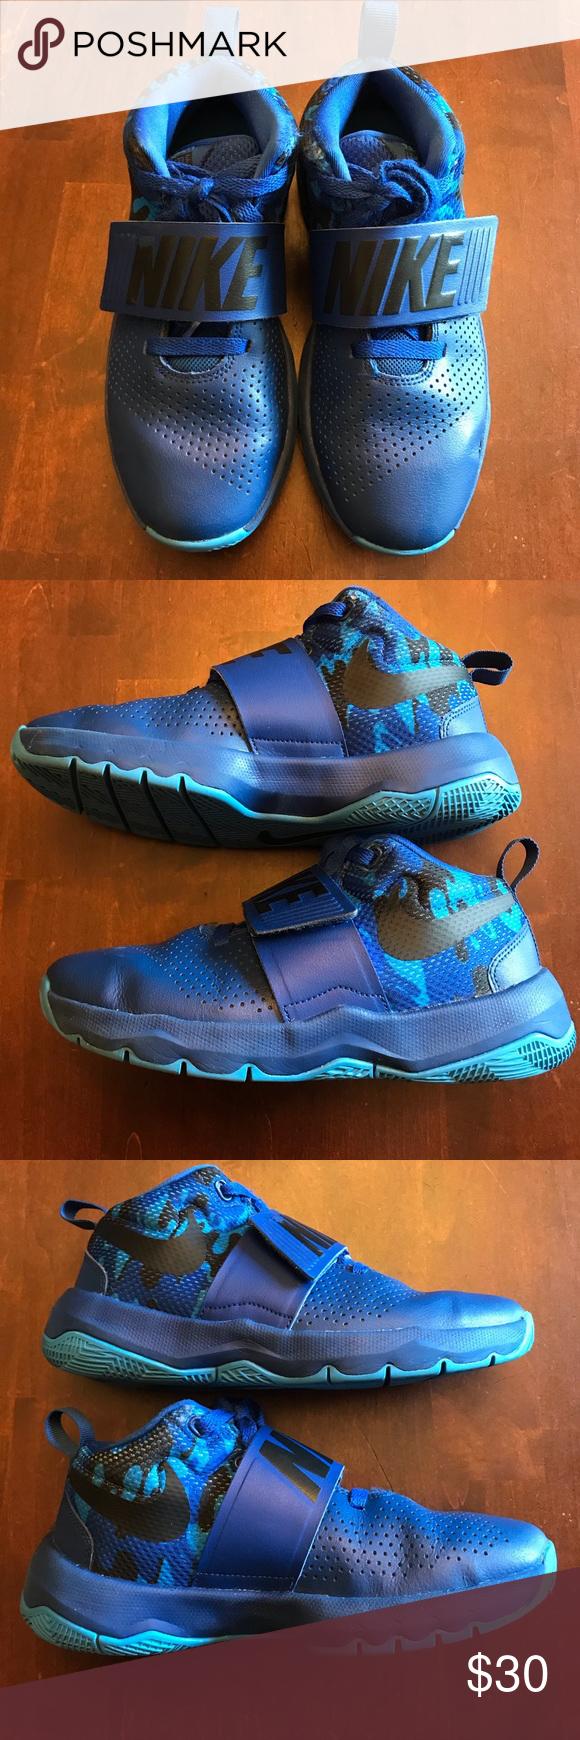 Boys Size 4.5 Blue/Camo Nike Team